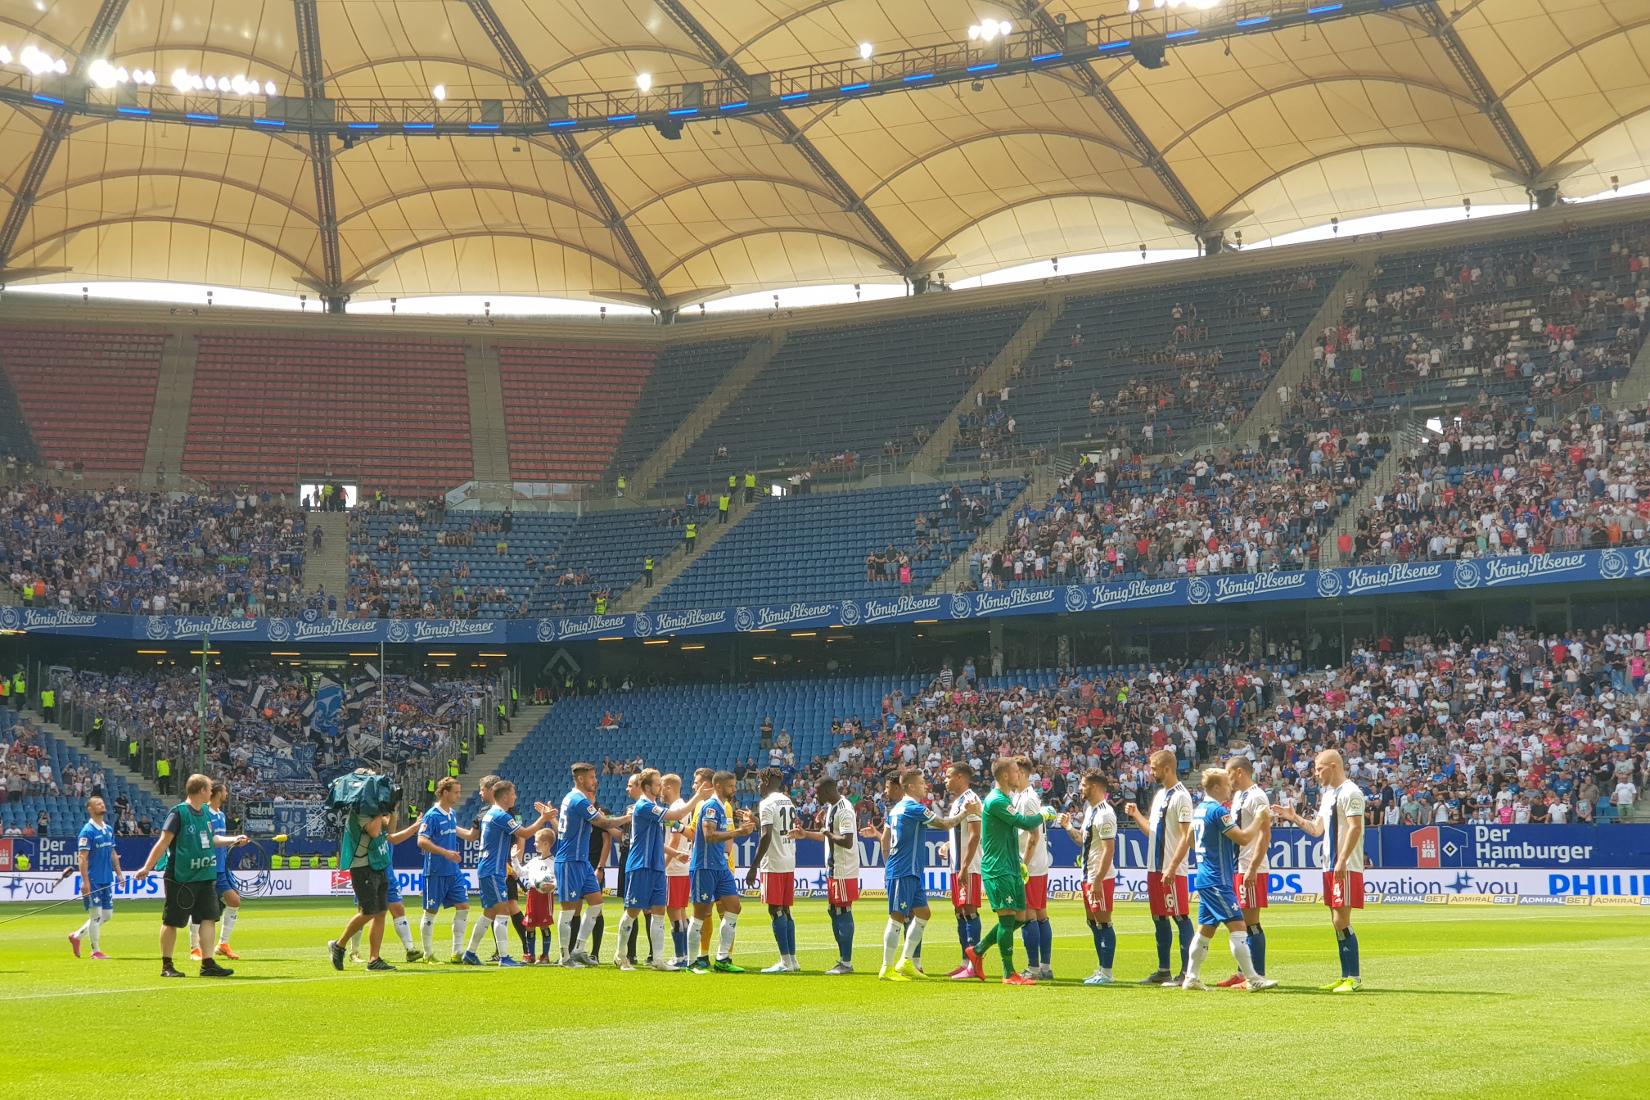 Hamburger SV – SV Darmstadt 98 1:1 (0:0)